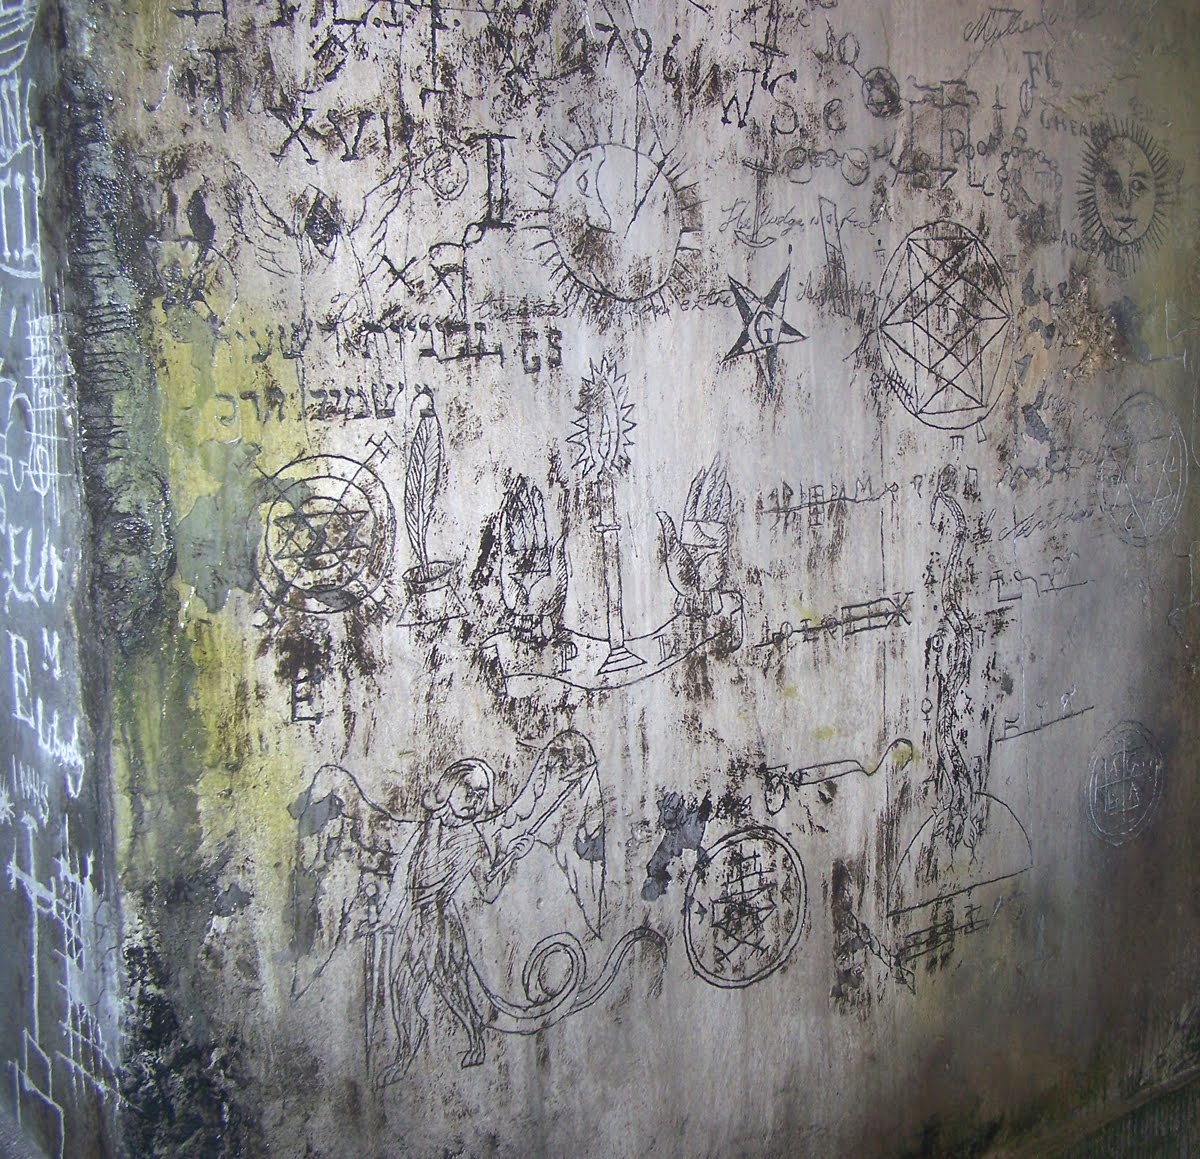 [Sherlock+holmes.Graffiti.blog]